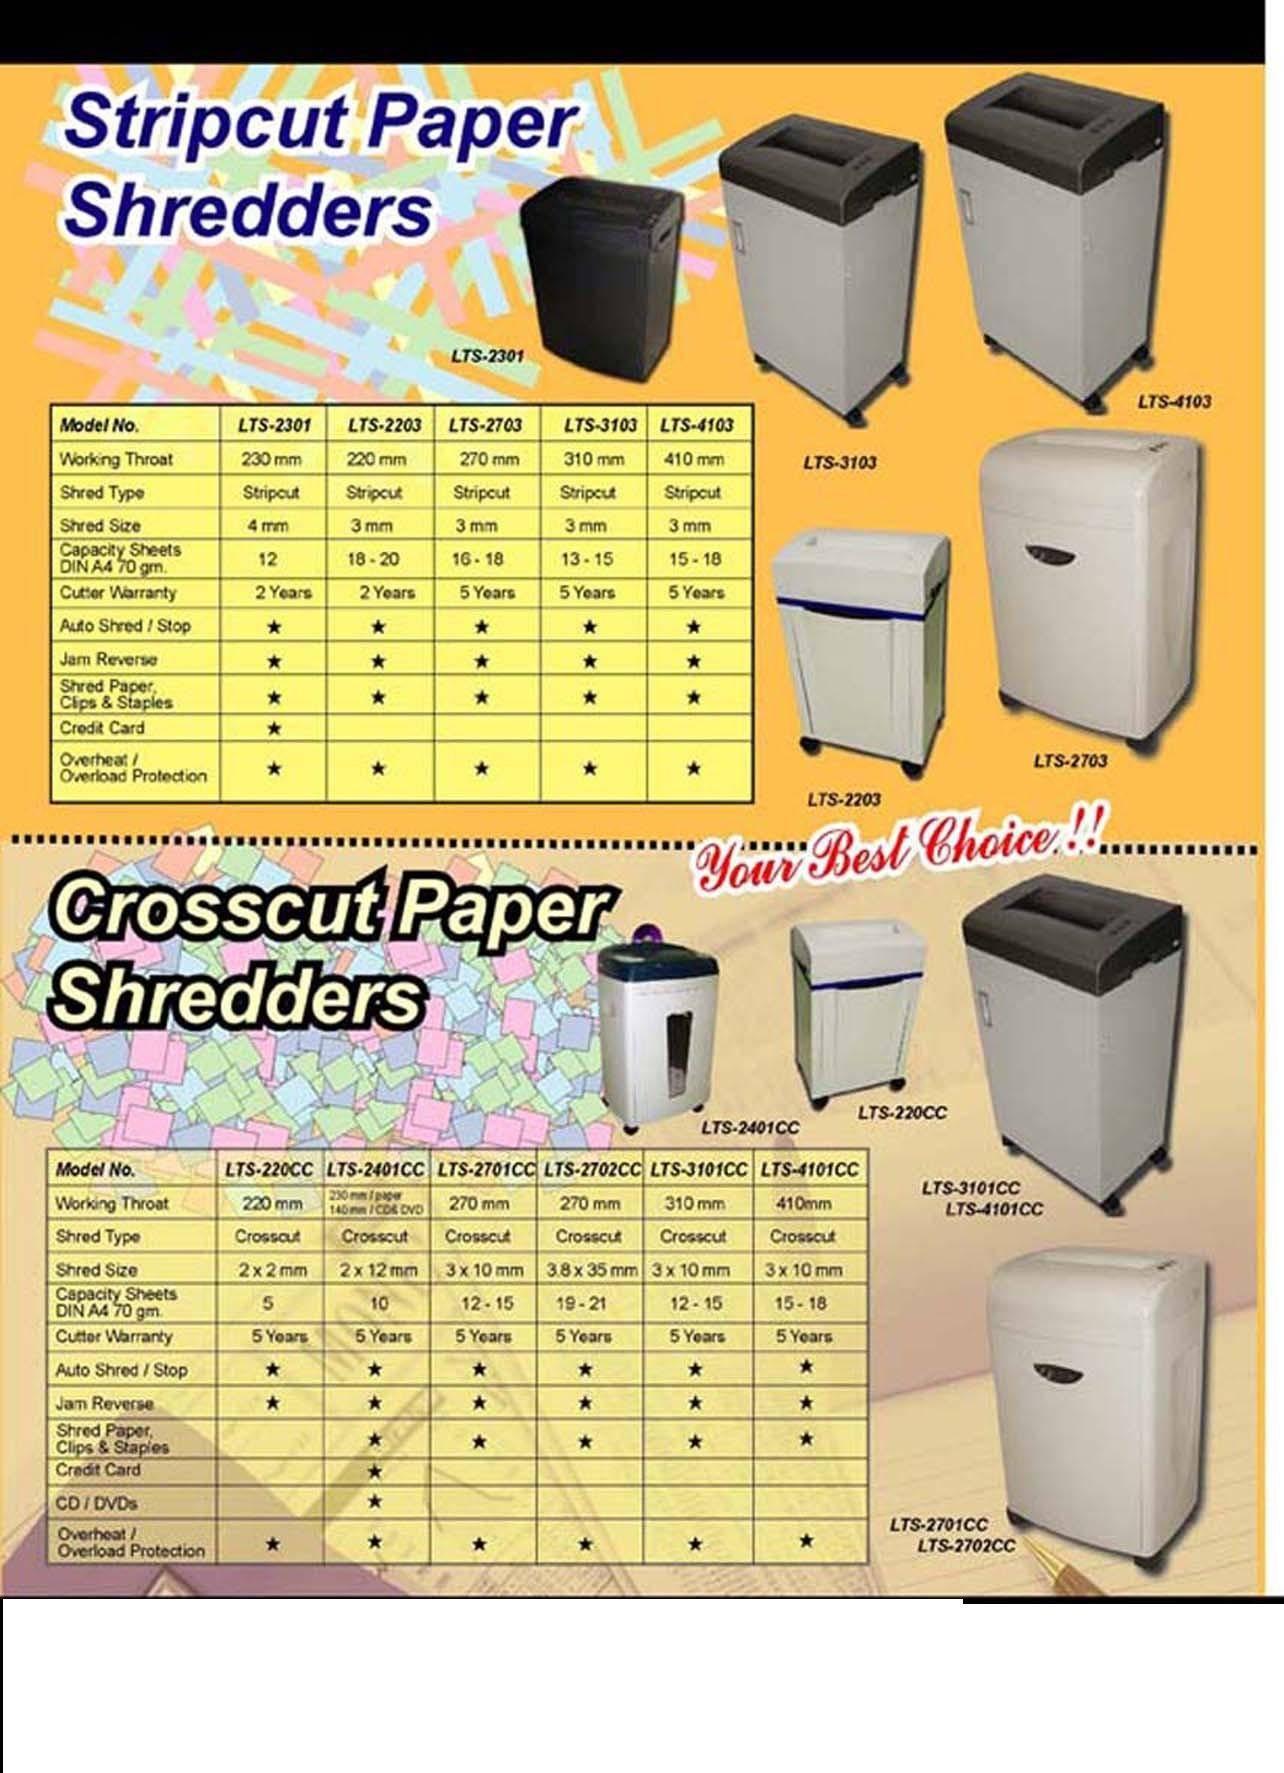 Taros Shredder,Intimus Paper shredder,Hsm Office Shredder,Shredding Services on site